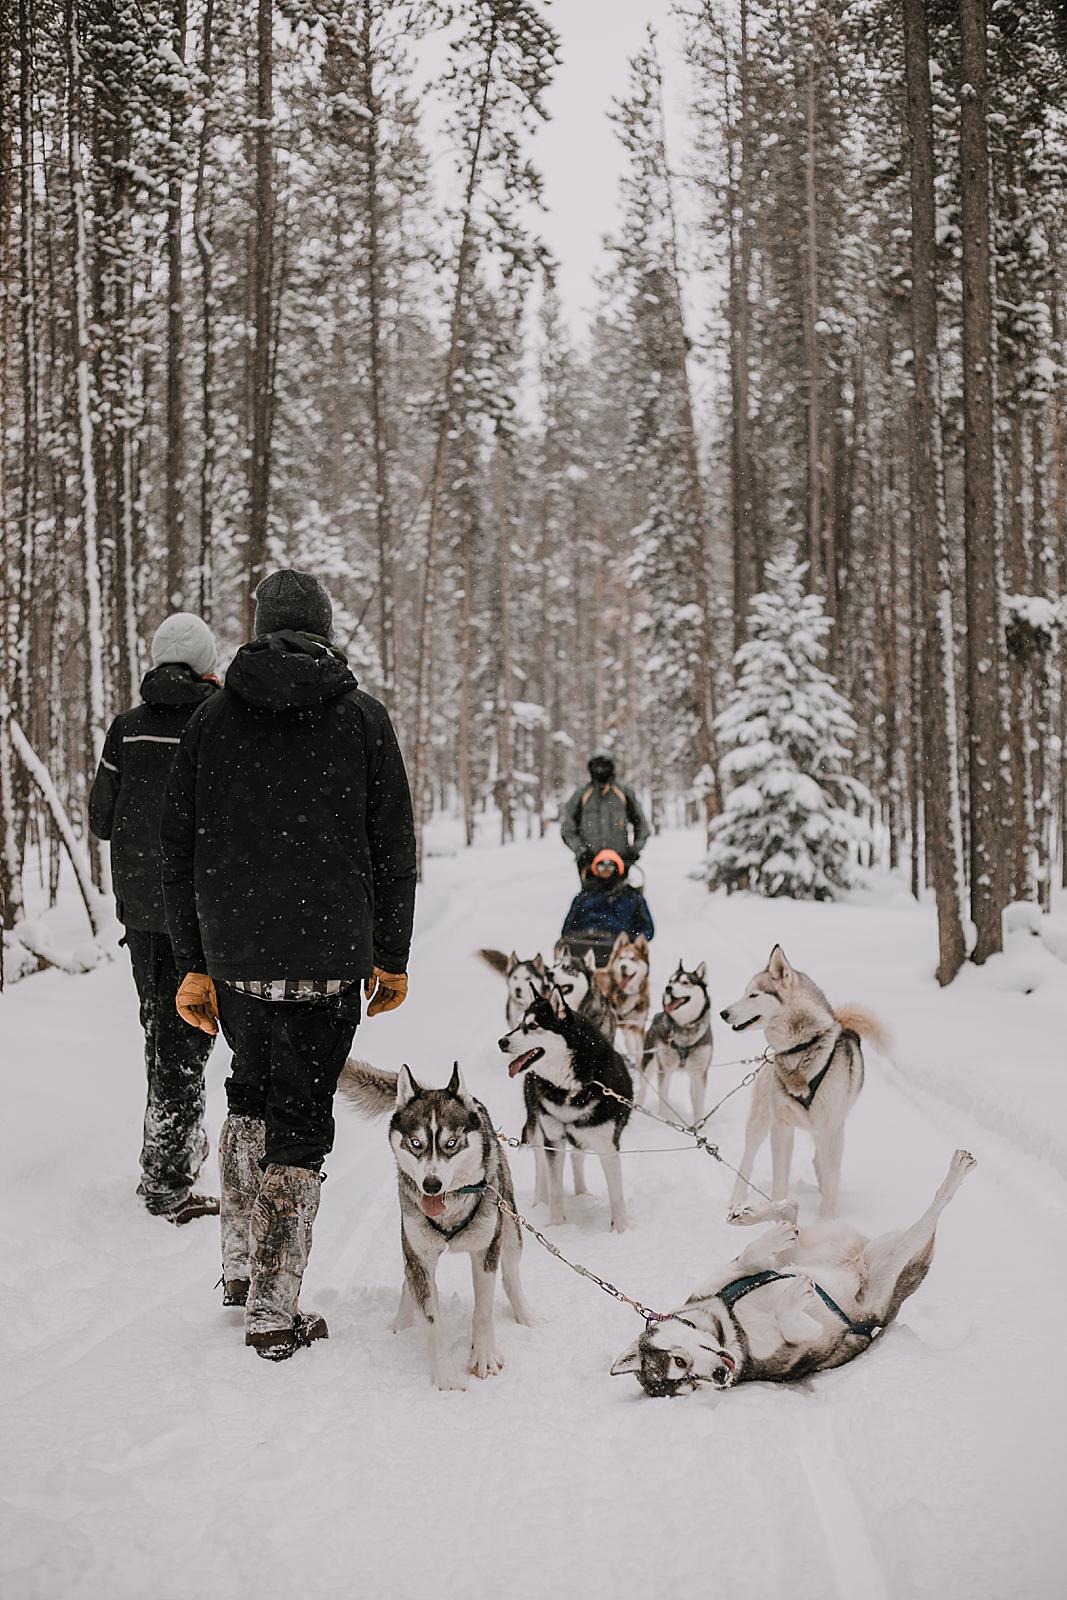 alaskan flat tire, sled dog, dogsledding, winter, winter elopement, winter wedding, breckenridge colorado photographer, colorado dog sledding, alaska  elopement, snowmobiling elopement